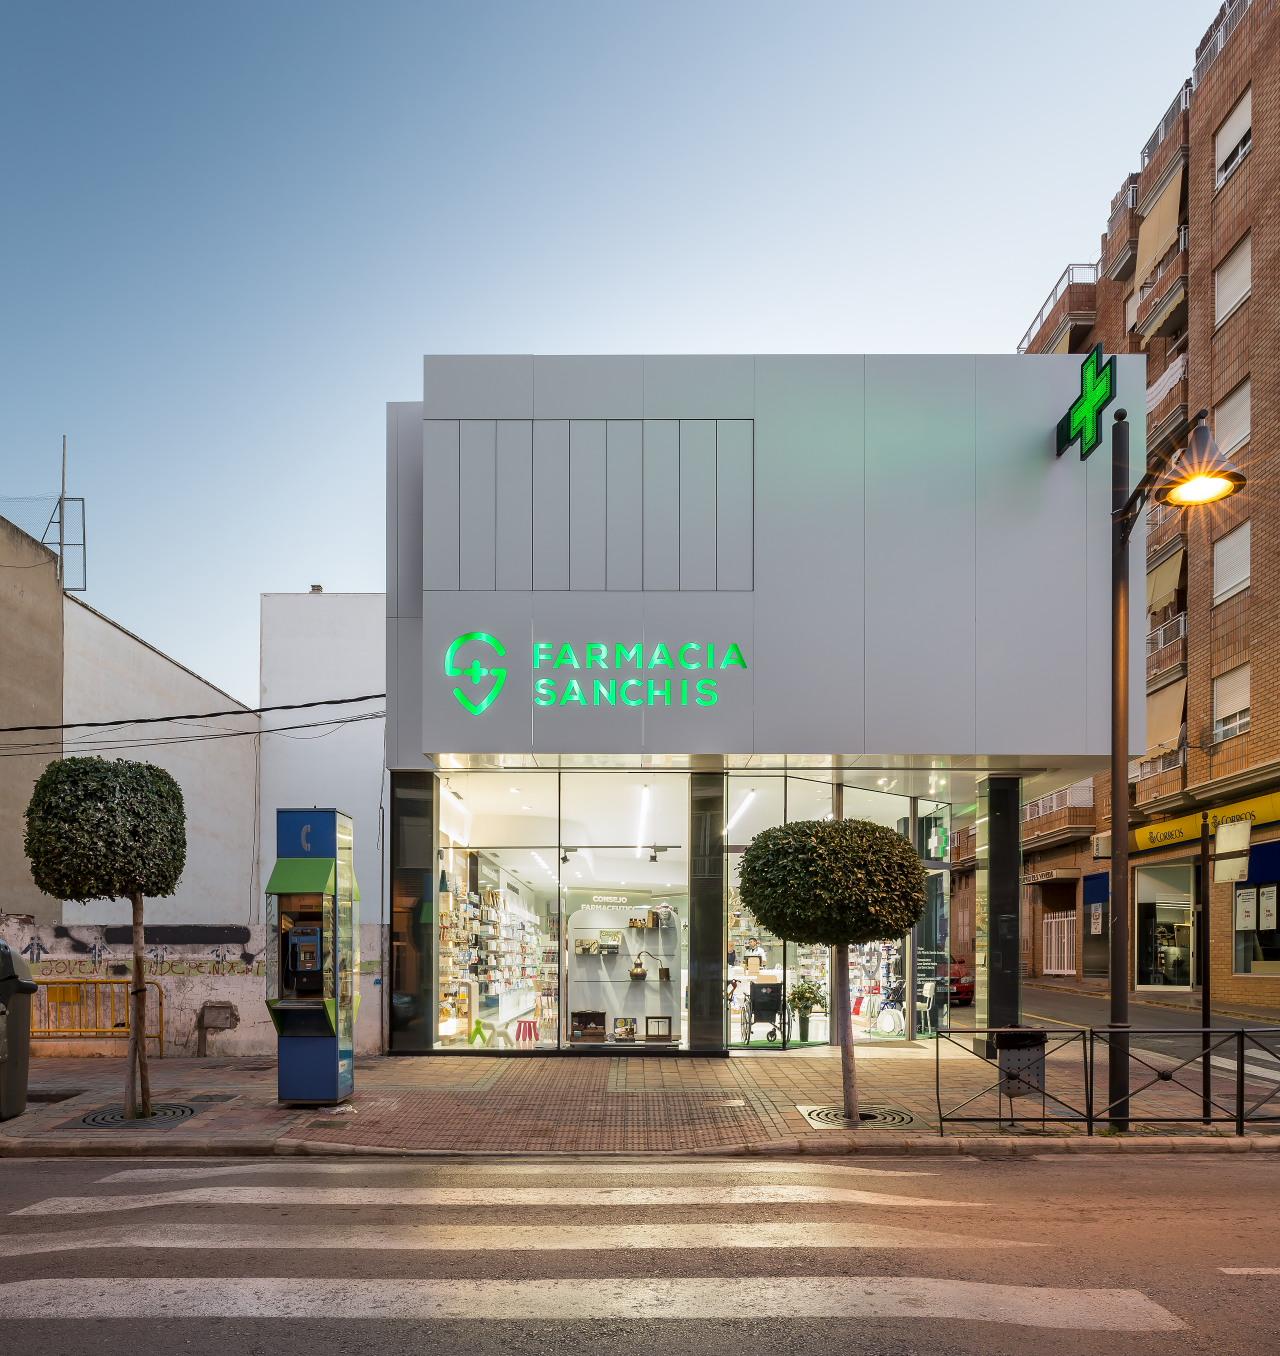 fotografia-arquitectura-valencia-german-cabo-d'estudio-farmacia-sanchis-ribarroja (31)